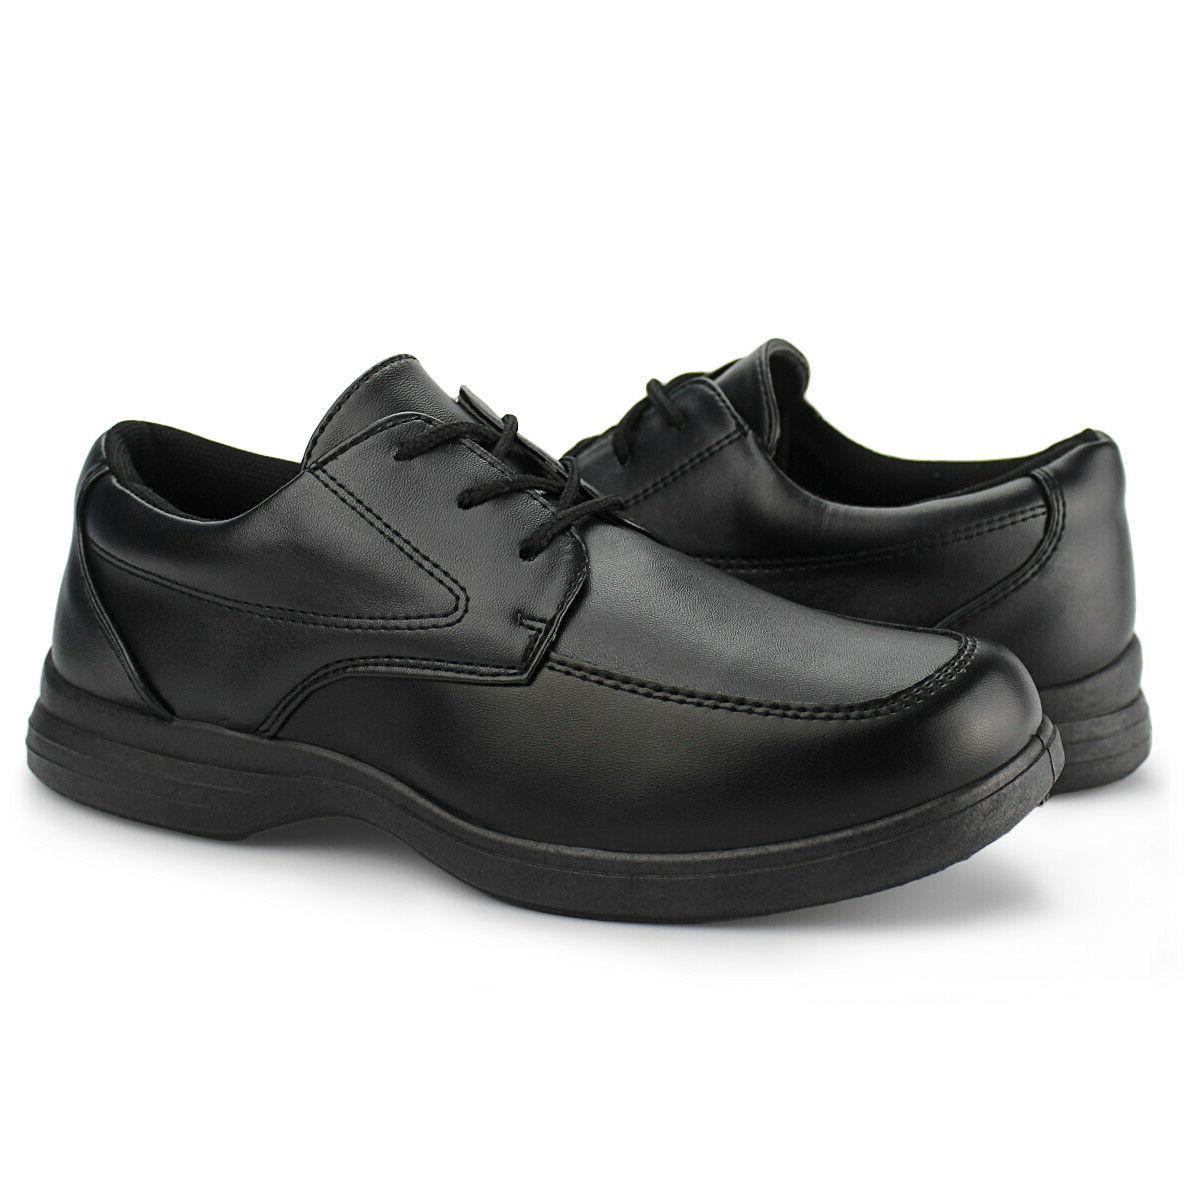 Boys Black School Shoes Kids Up Oxford Flat Hawkwell